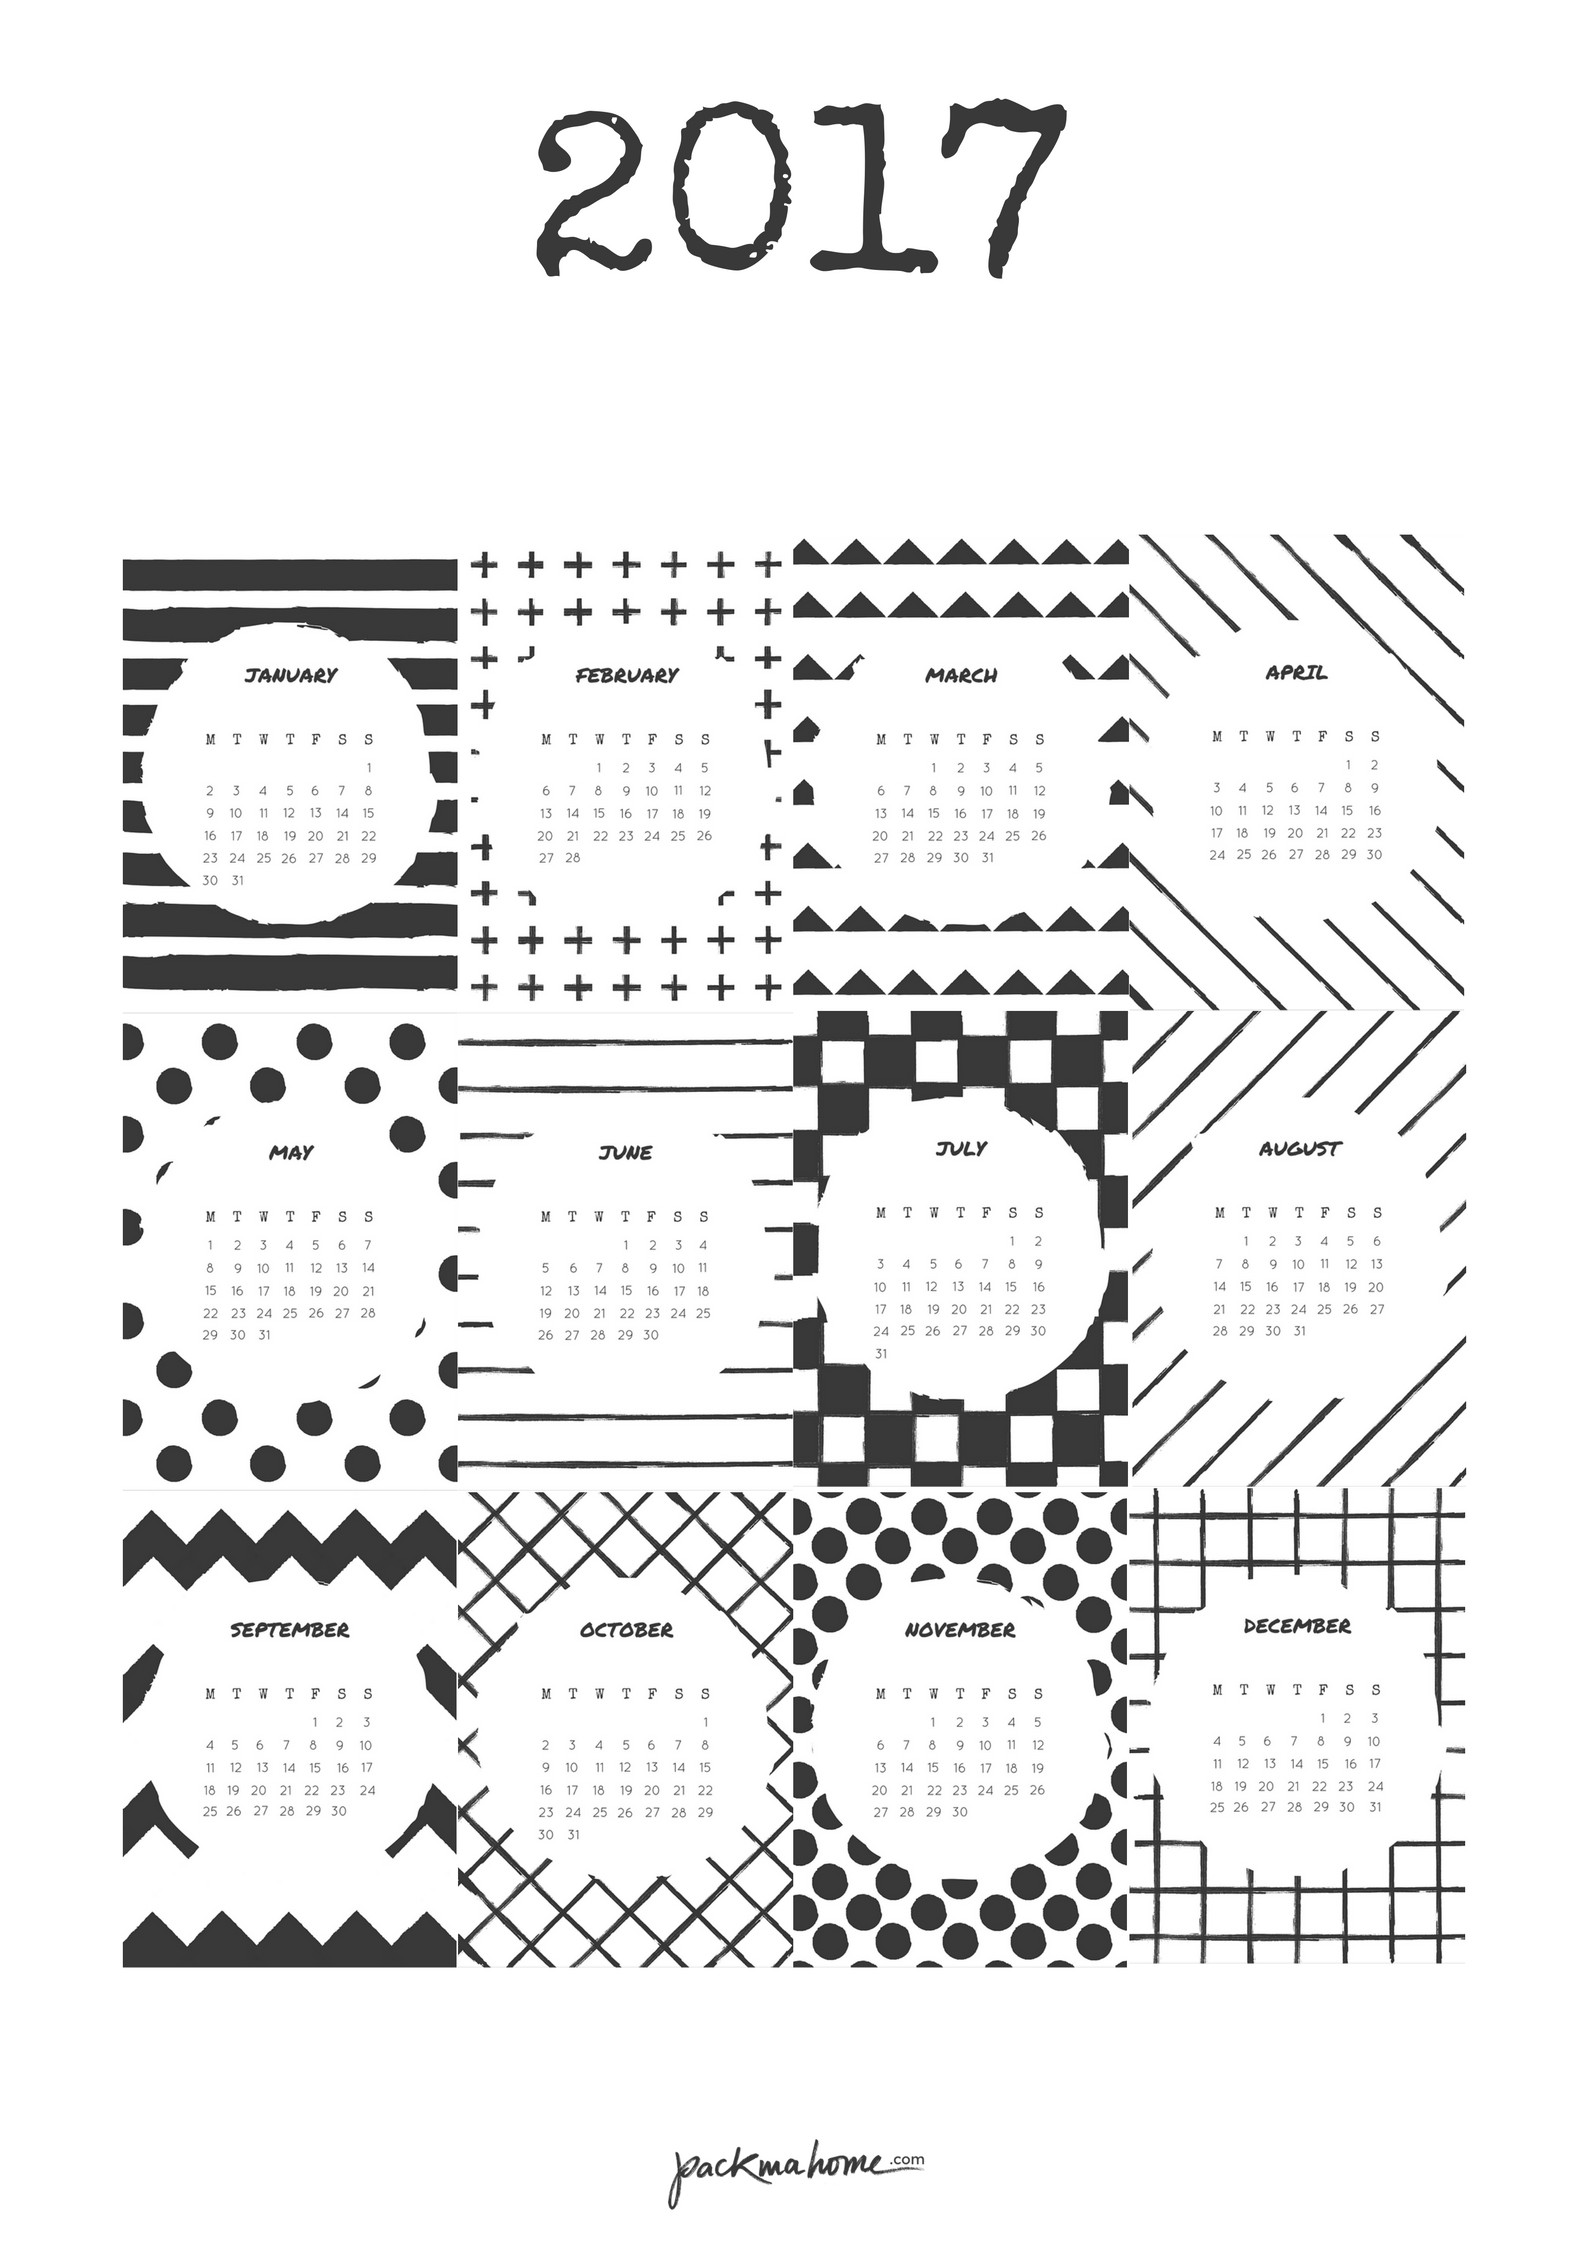 Calendario Imprimir Maio 2017 Mejores Y Más Novedosos Free Printable 2017 Calendar Printables Pinterest Of Calendario Imprimir Maio 2017 Mejores Y Más Novedosos Pin De Keila andrade Em Sala De Aula